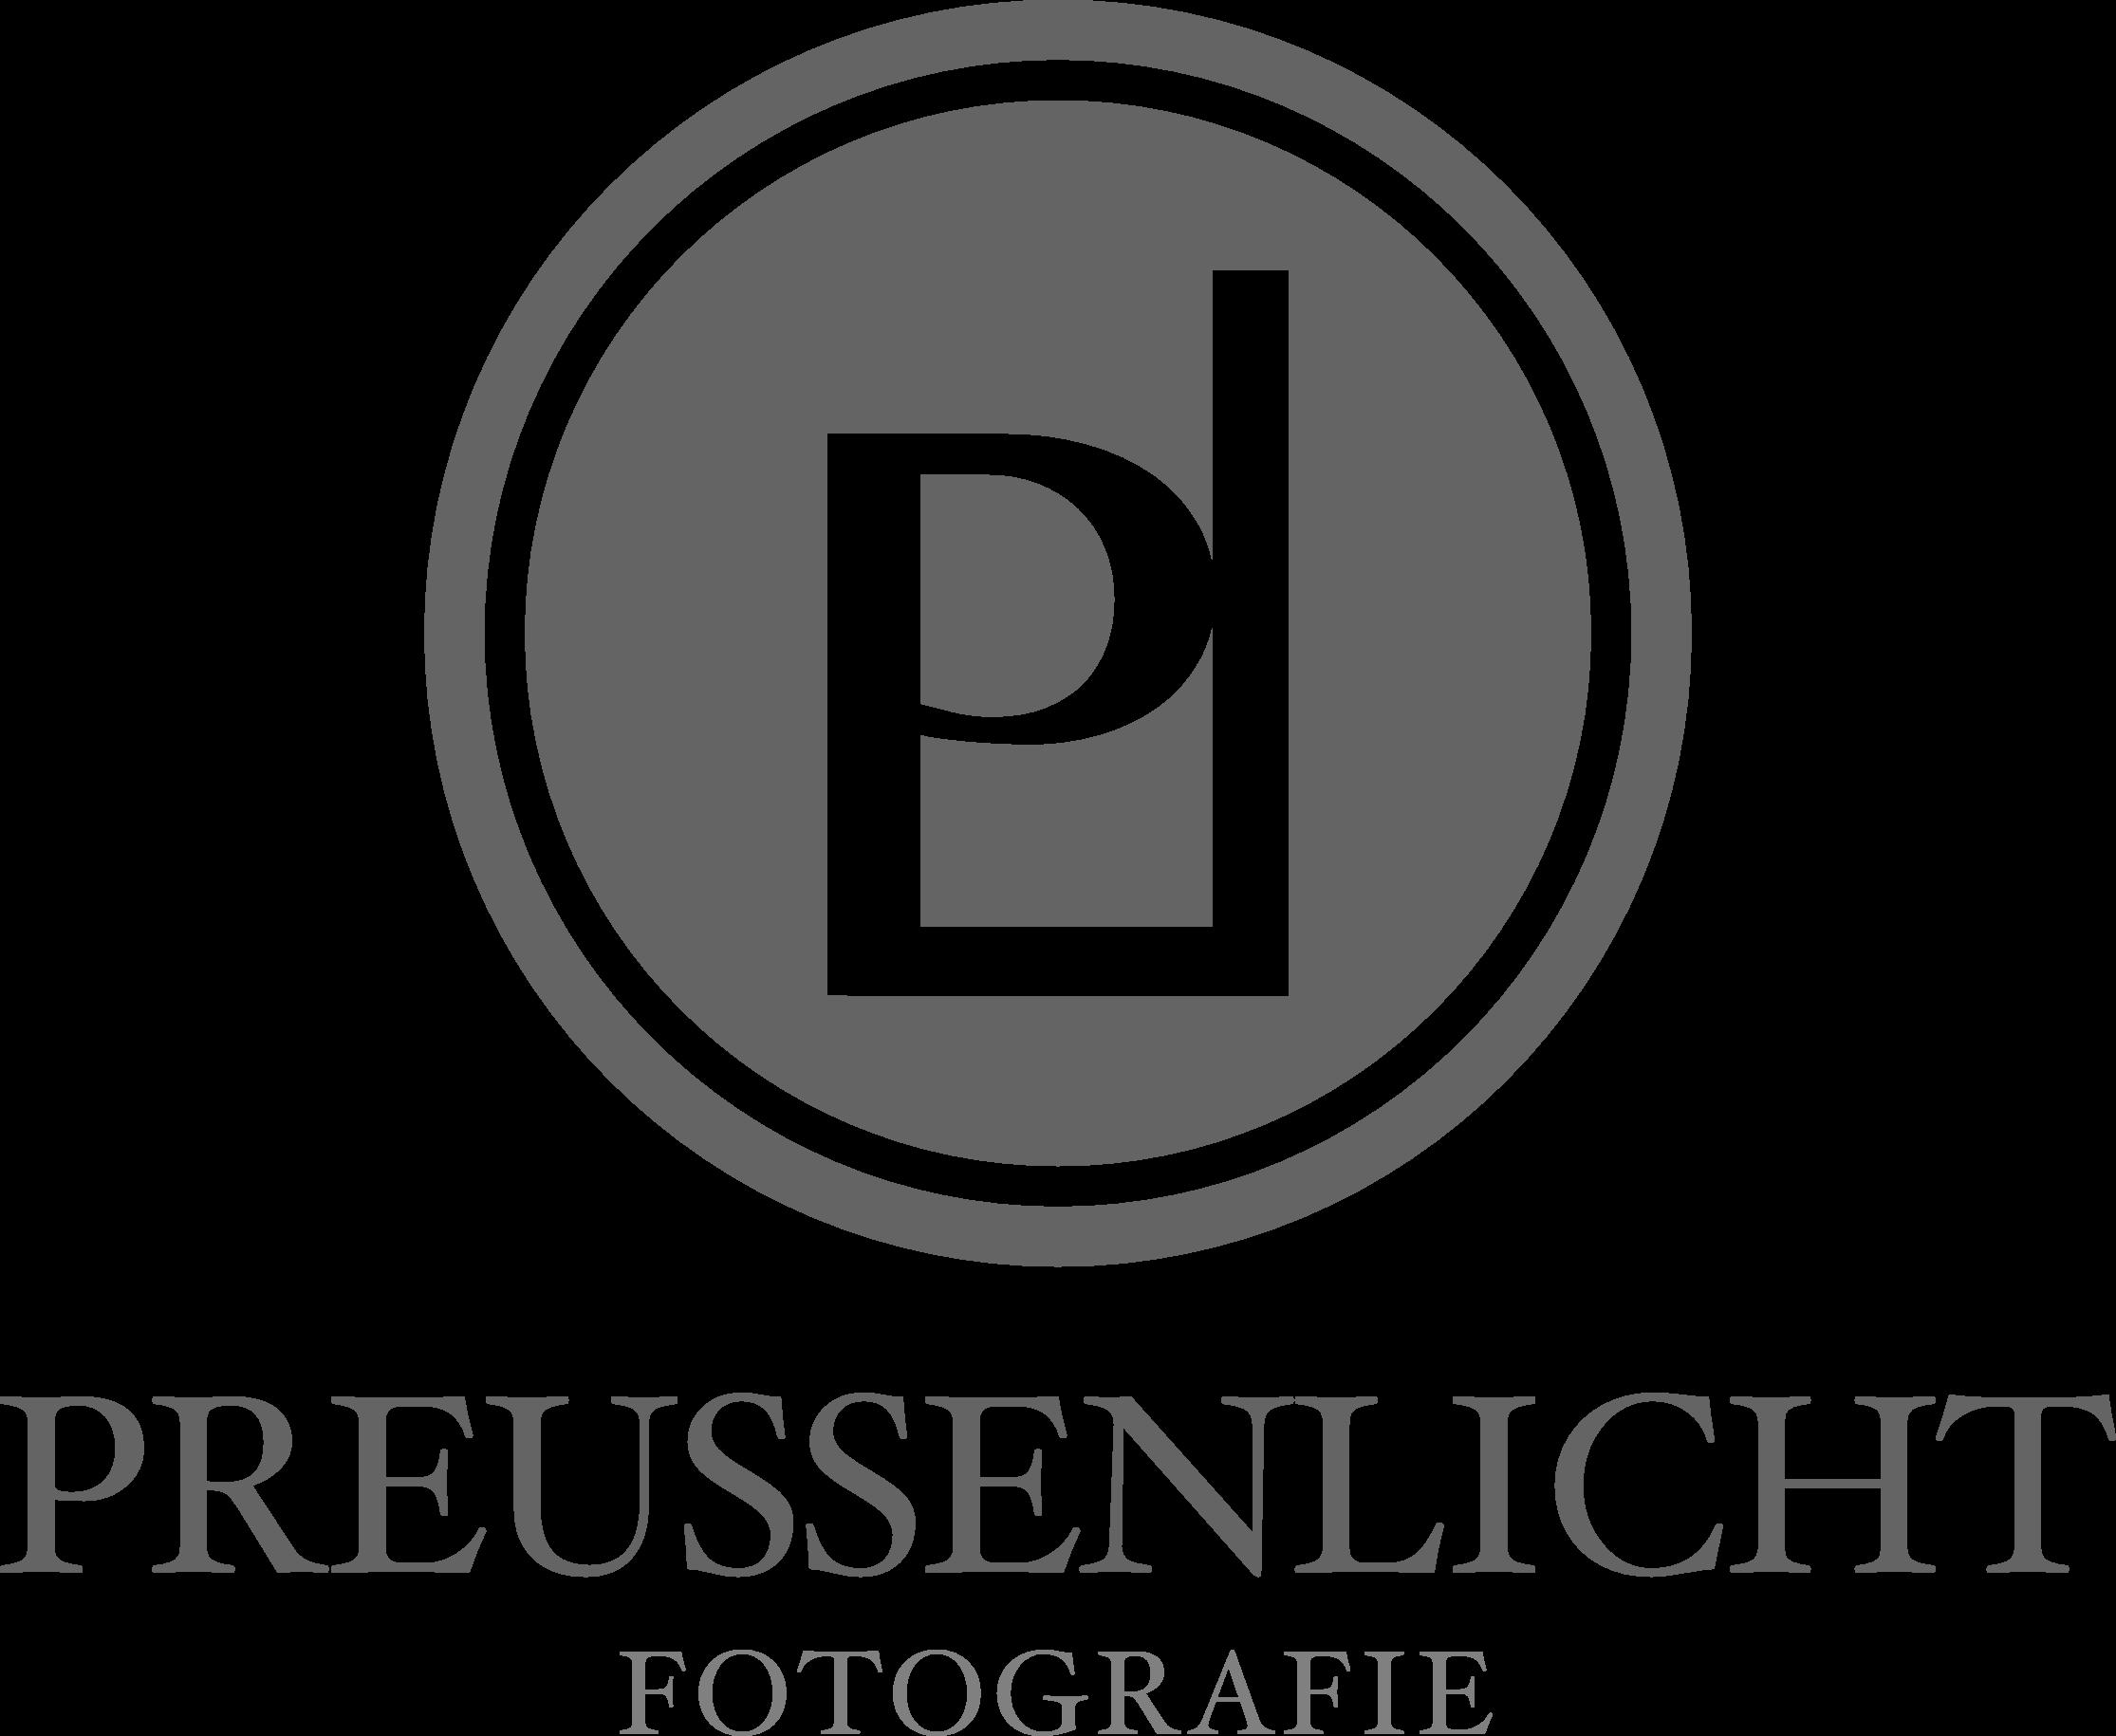 Preussenlicht Fotografie